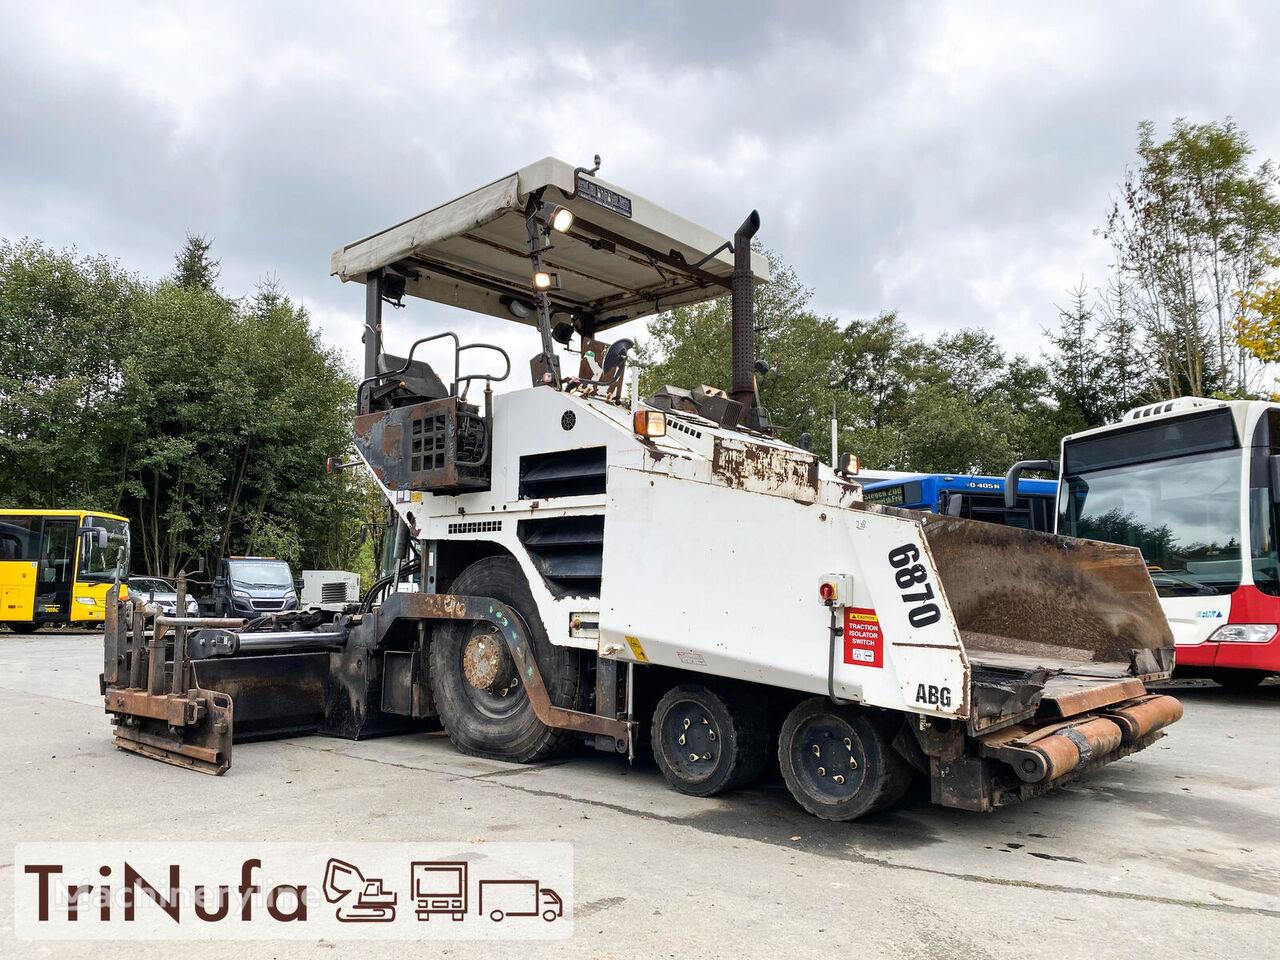 finisor asfalt pe roţi VOLVO 6870 ABG | Fertigungsbreite 5,3m |